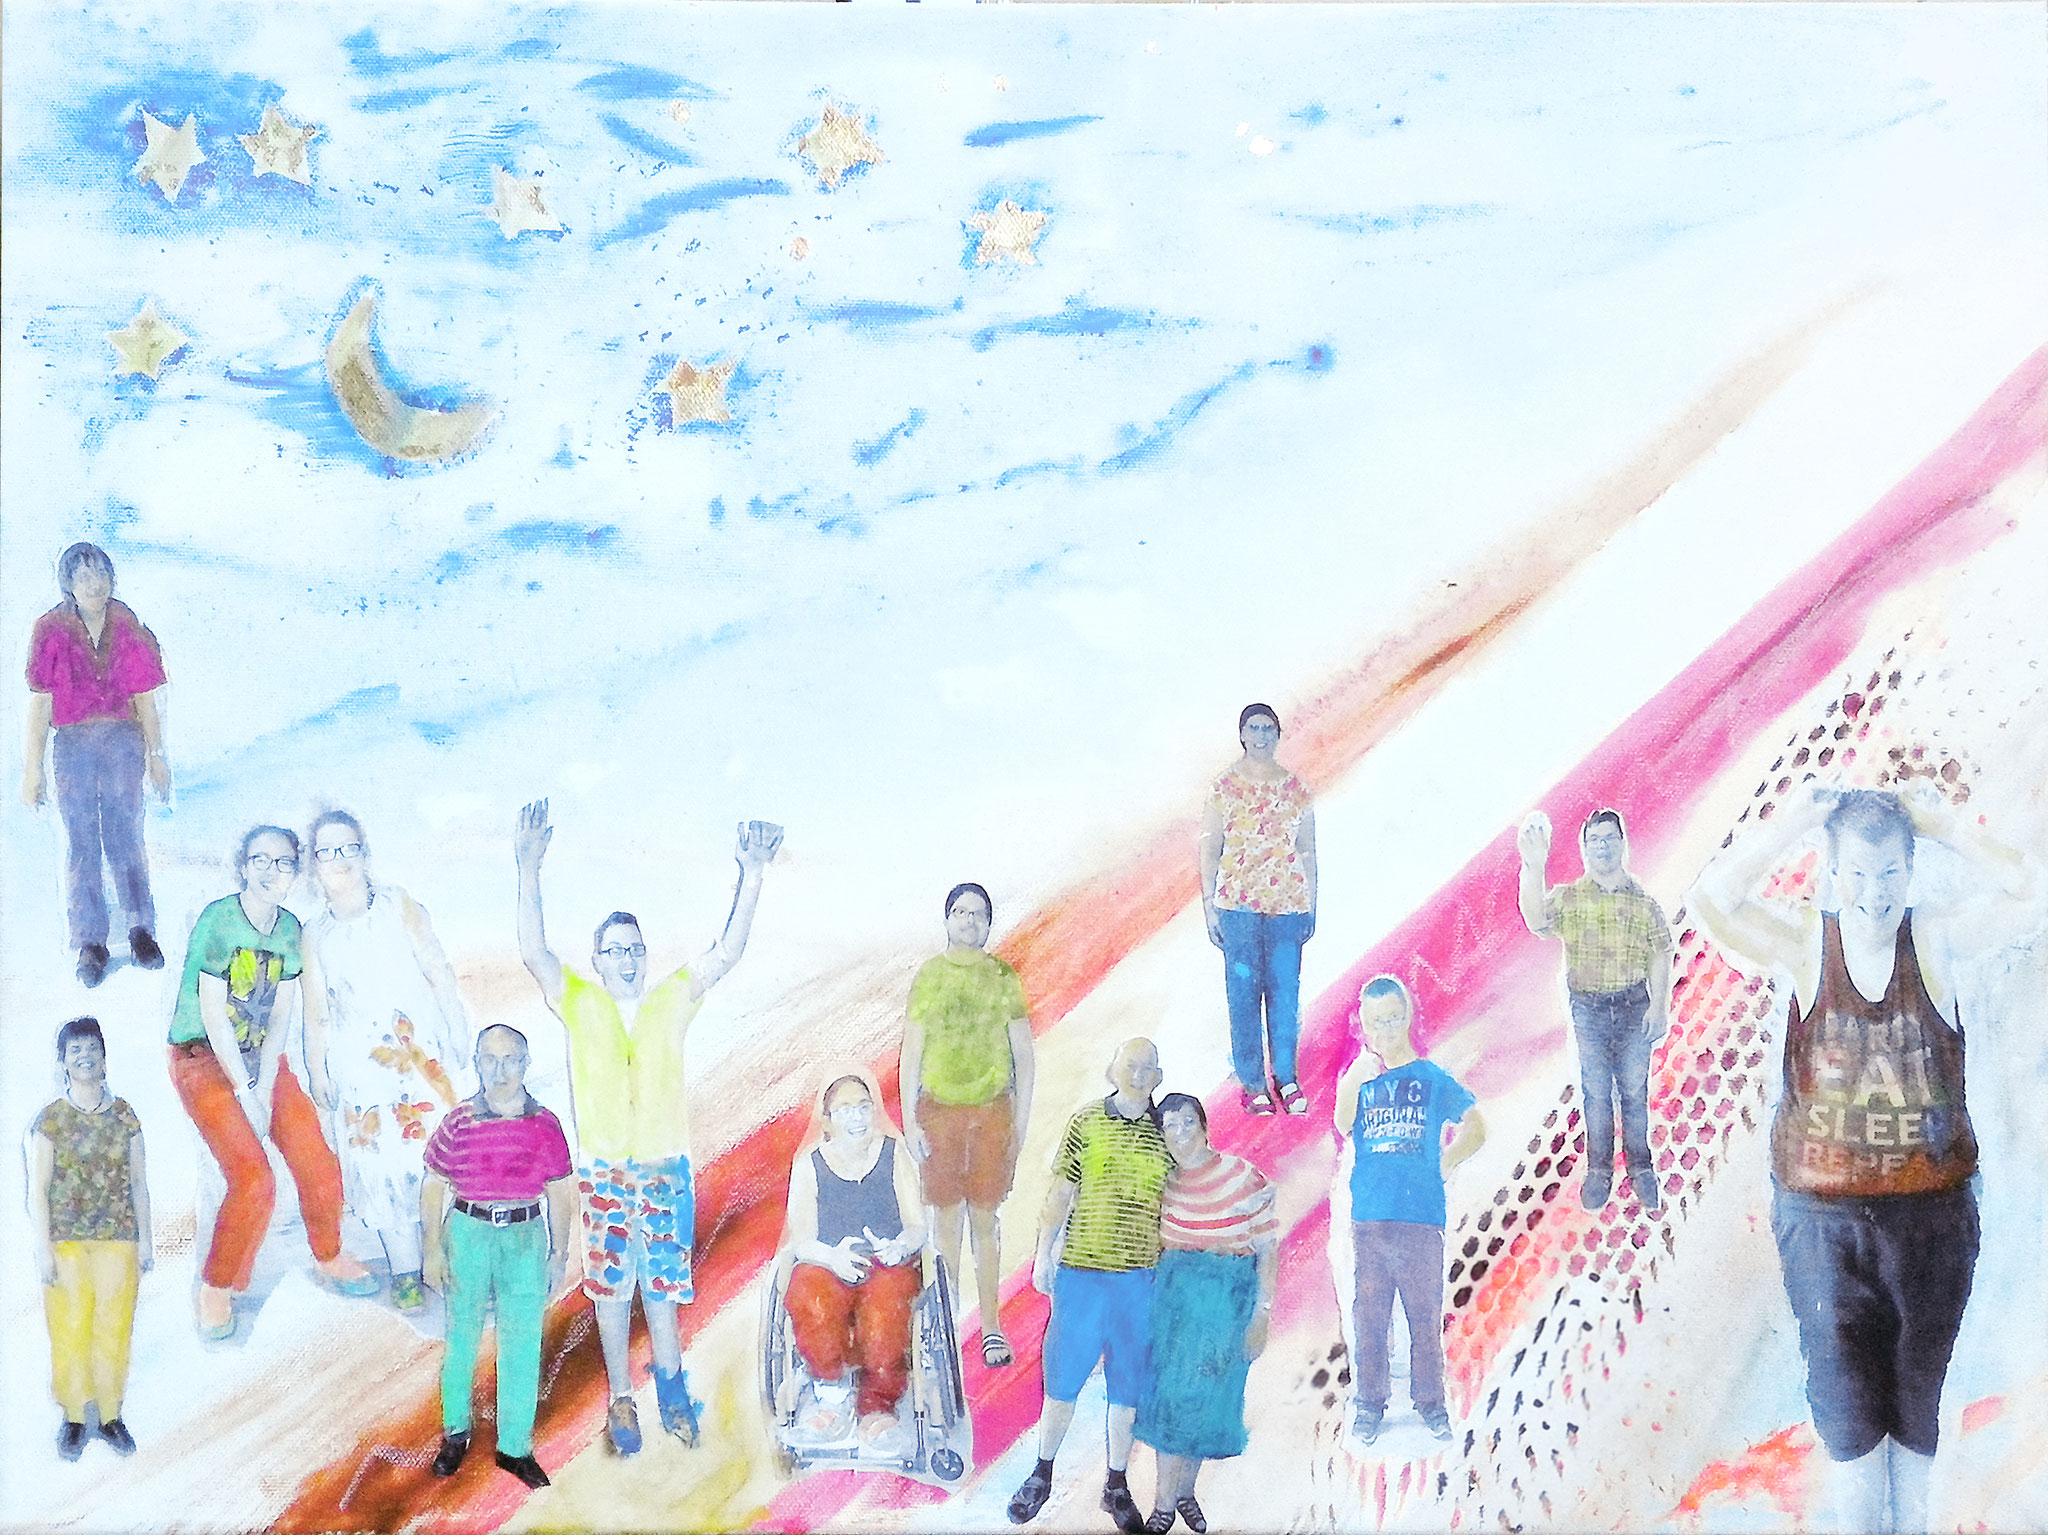 Freie kreative Collage Gruppenarbeit